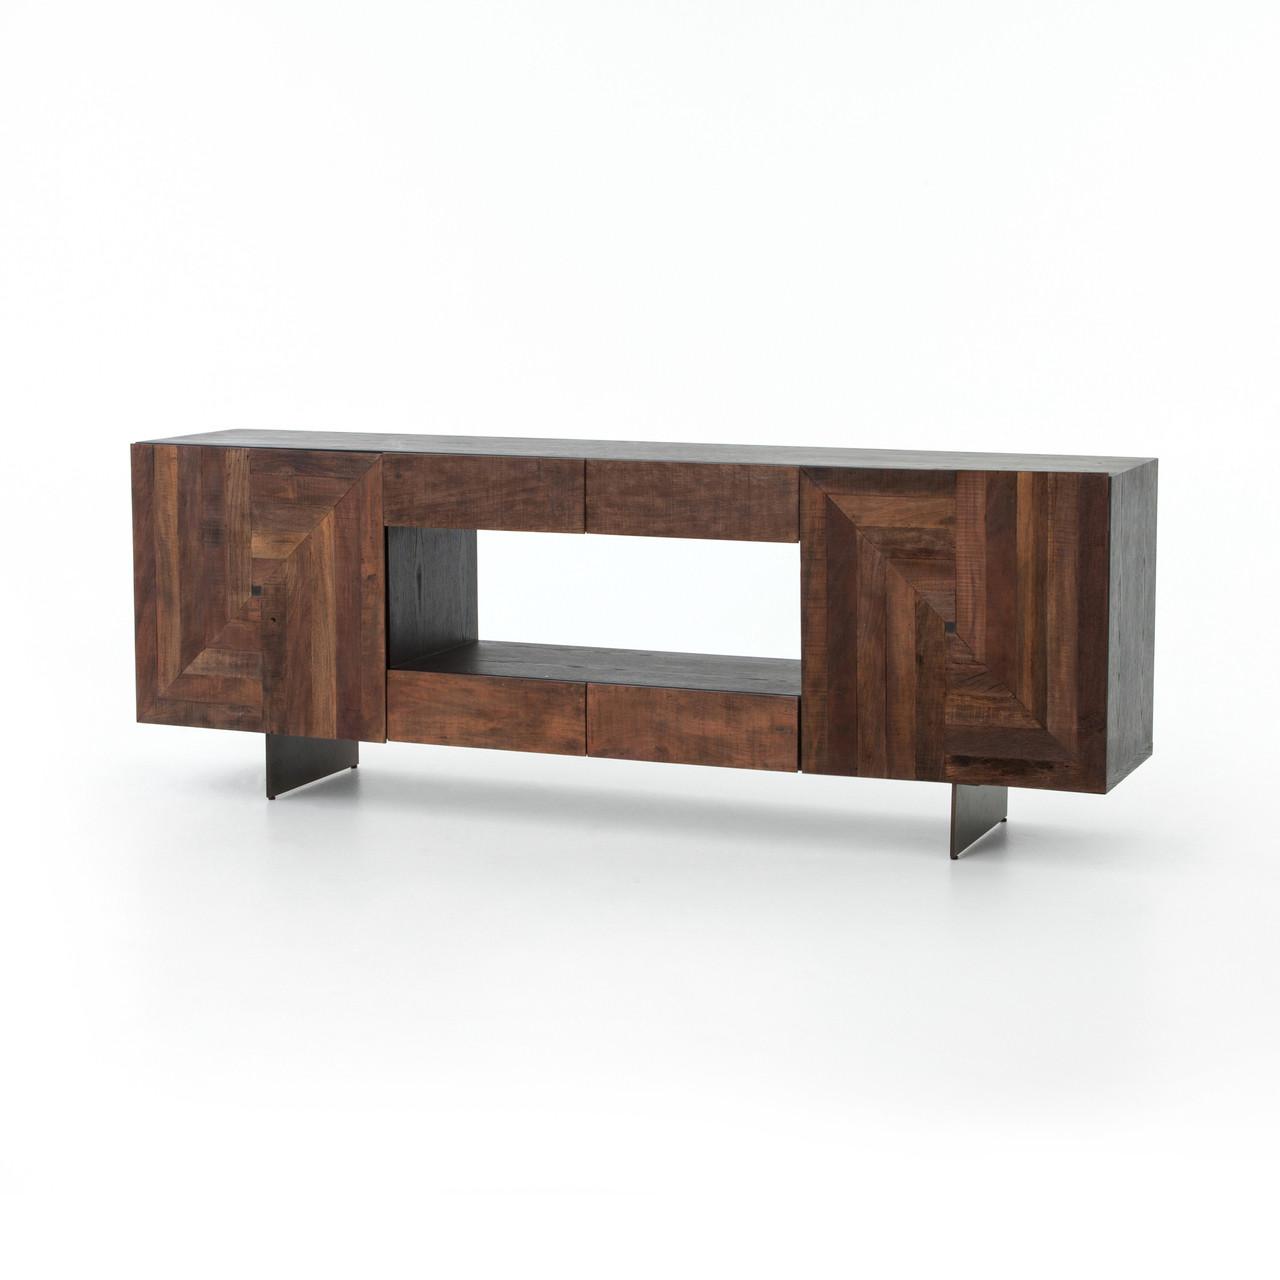 Reclaimed Wood Antique Bronze Leg Media Cabinet - Reclaimed Wood Antique Bronze Leg Media Cabinet Zin Home